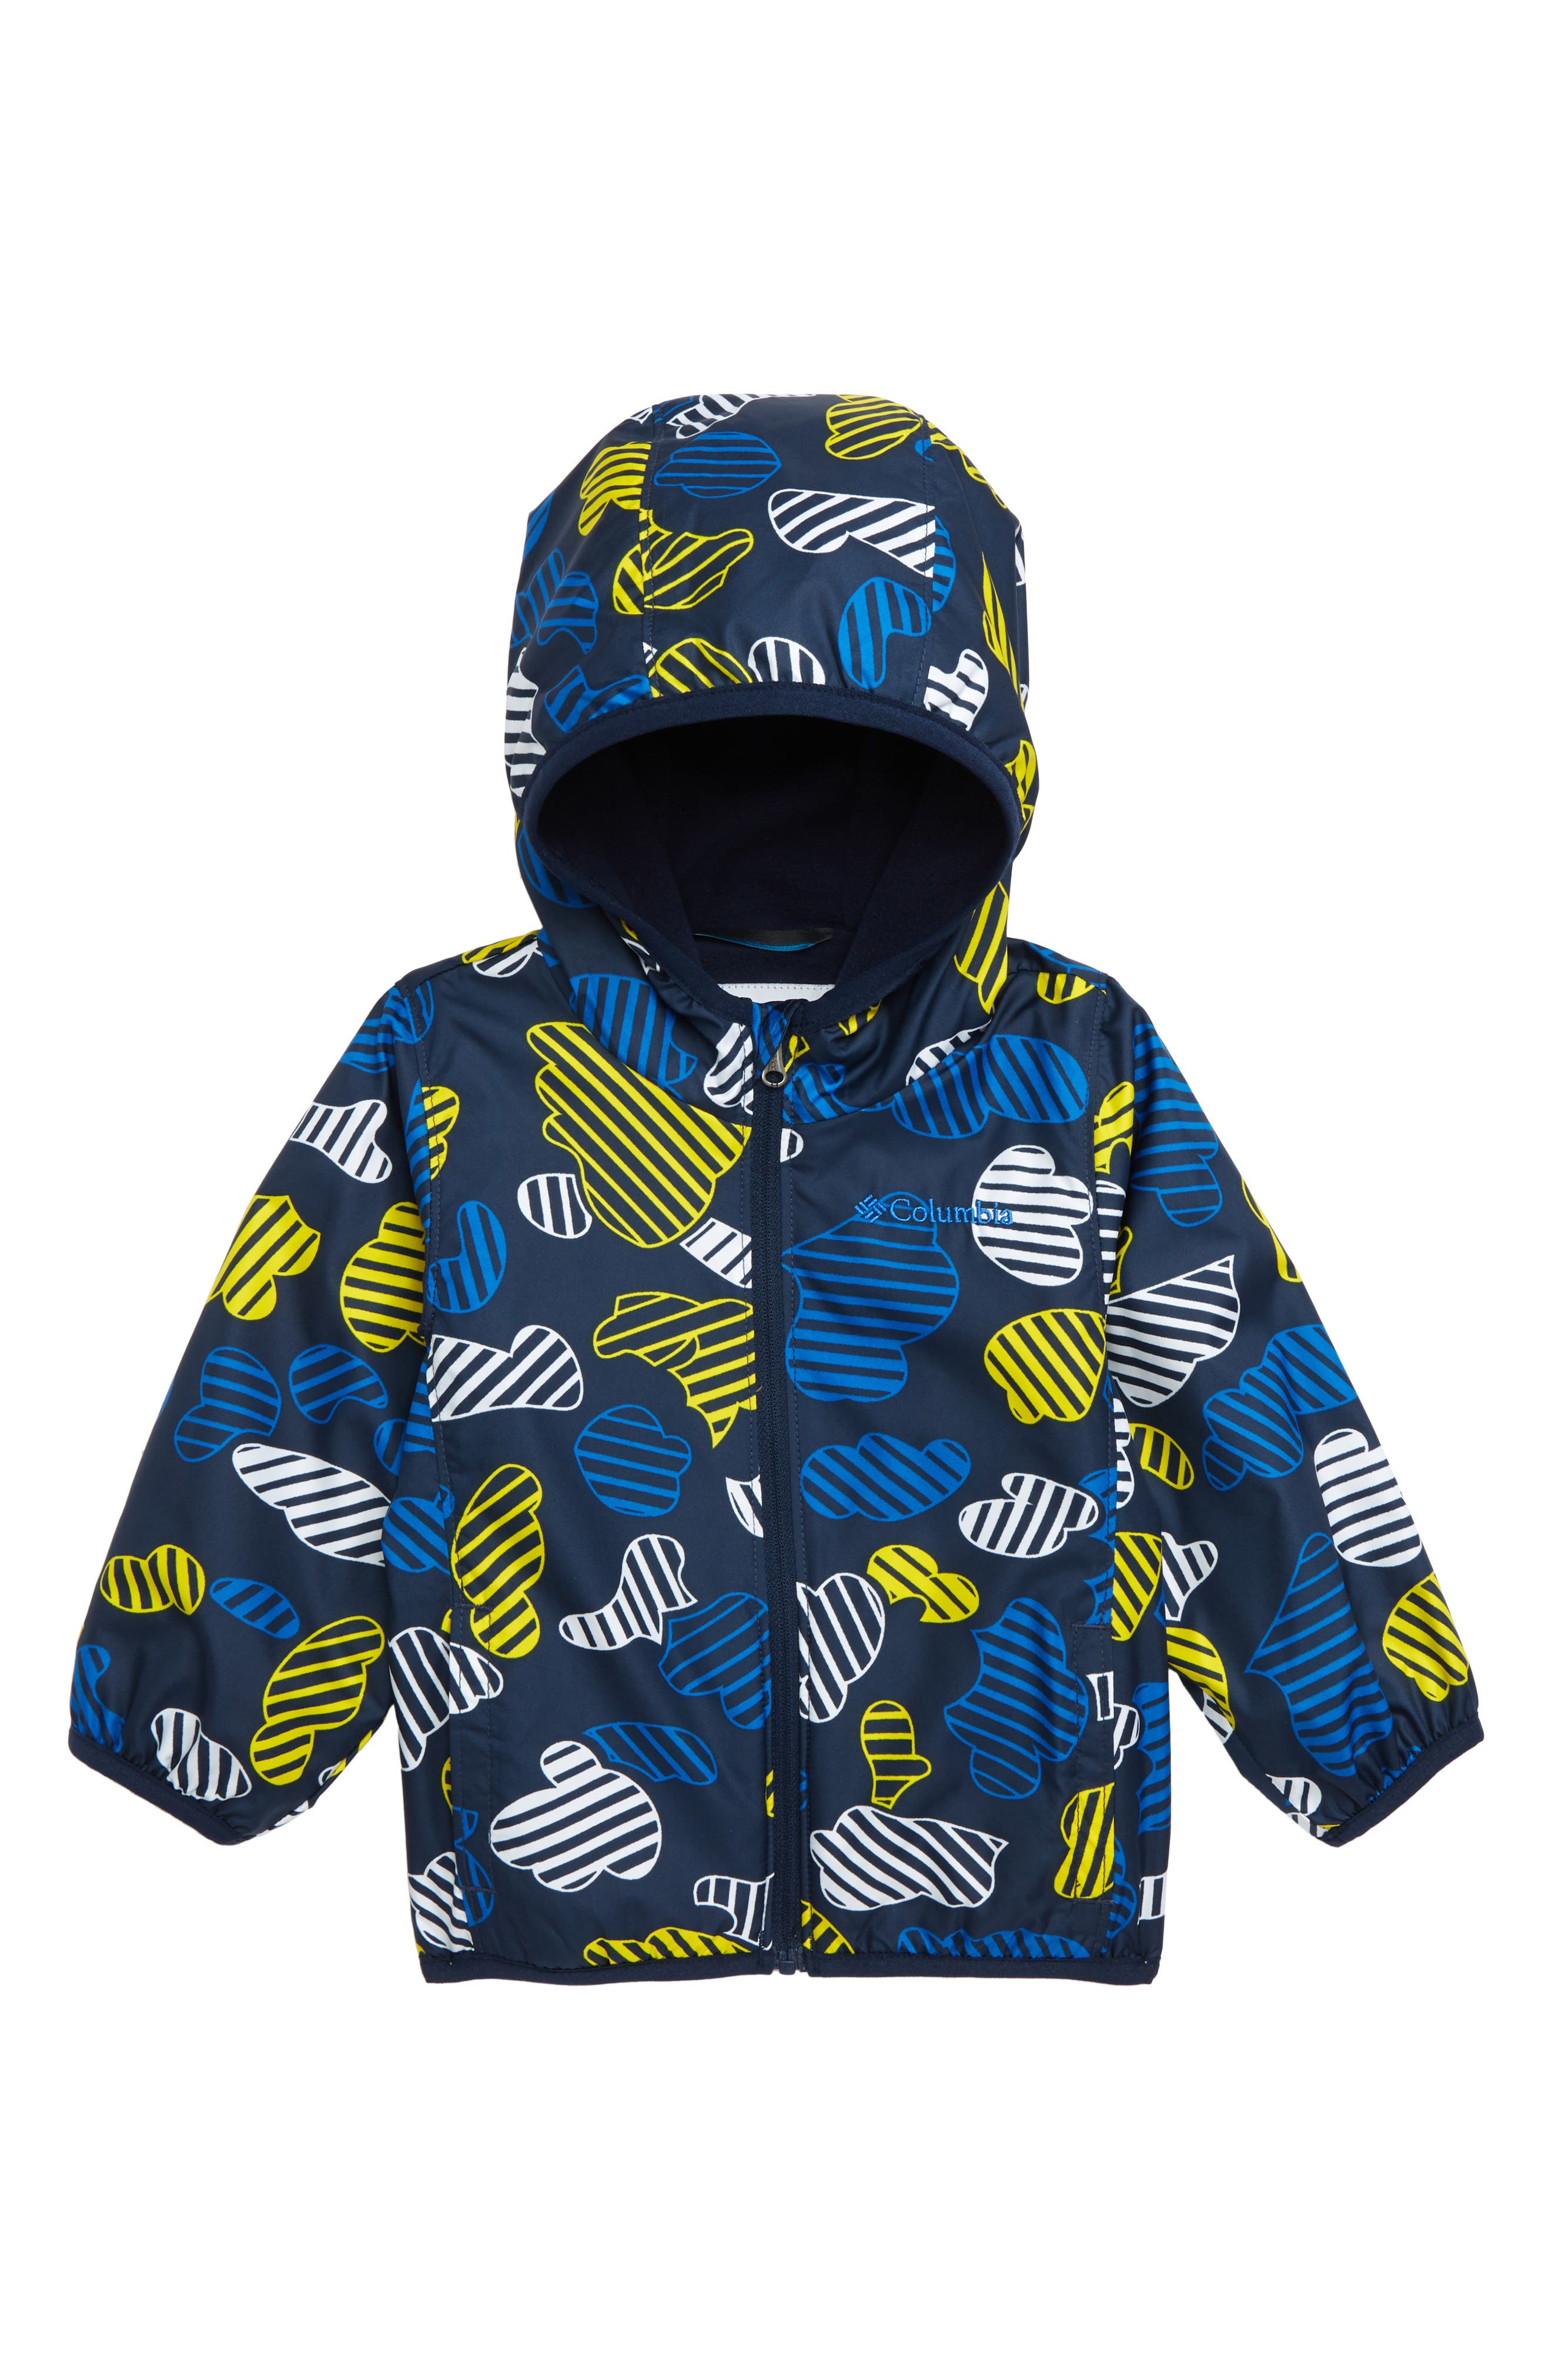 752bf17560331 Infant Boy s Columbia Mini Pixel Grabber(TM) Ii Water Resistant Hooded  Jacket